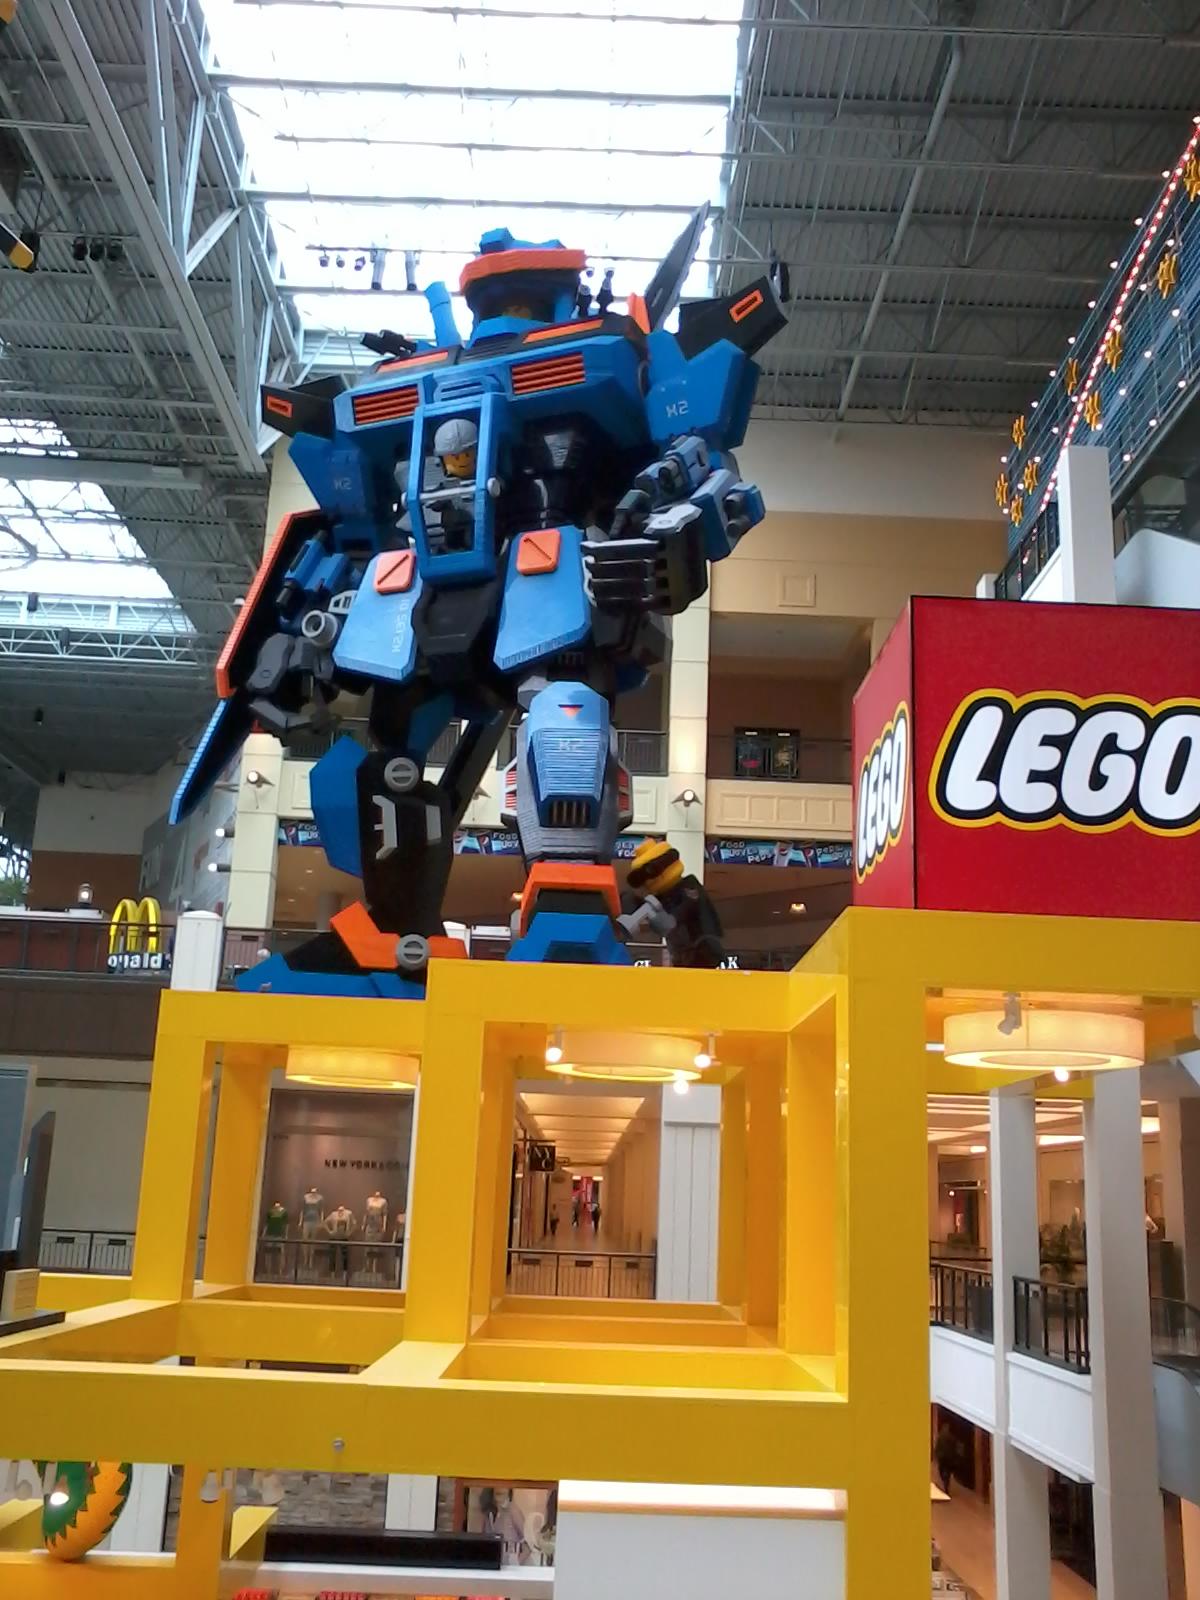 Giant LEGO-transformer